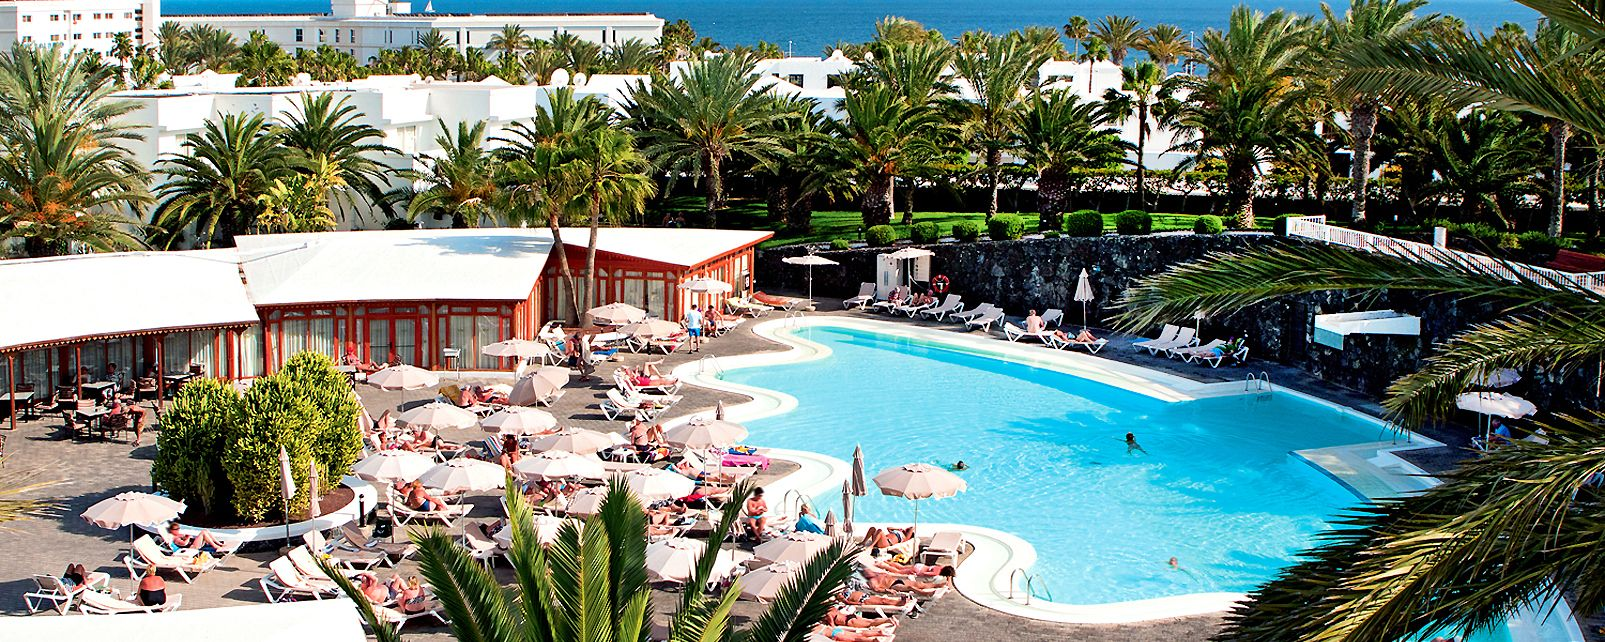 Hotel Relaxia Olivina Lanzarote